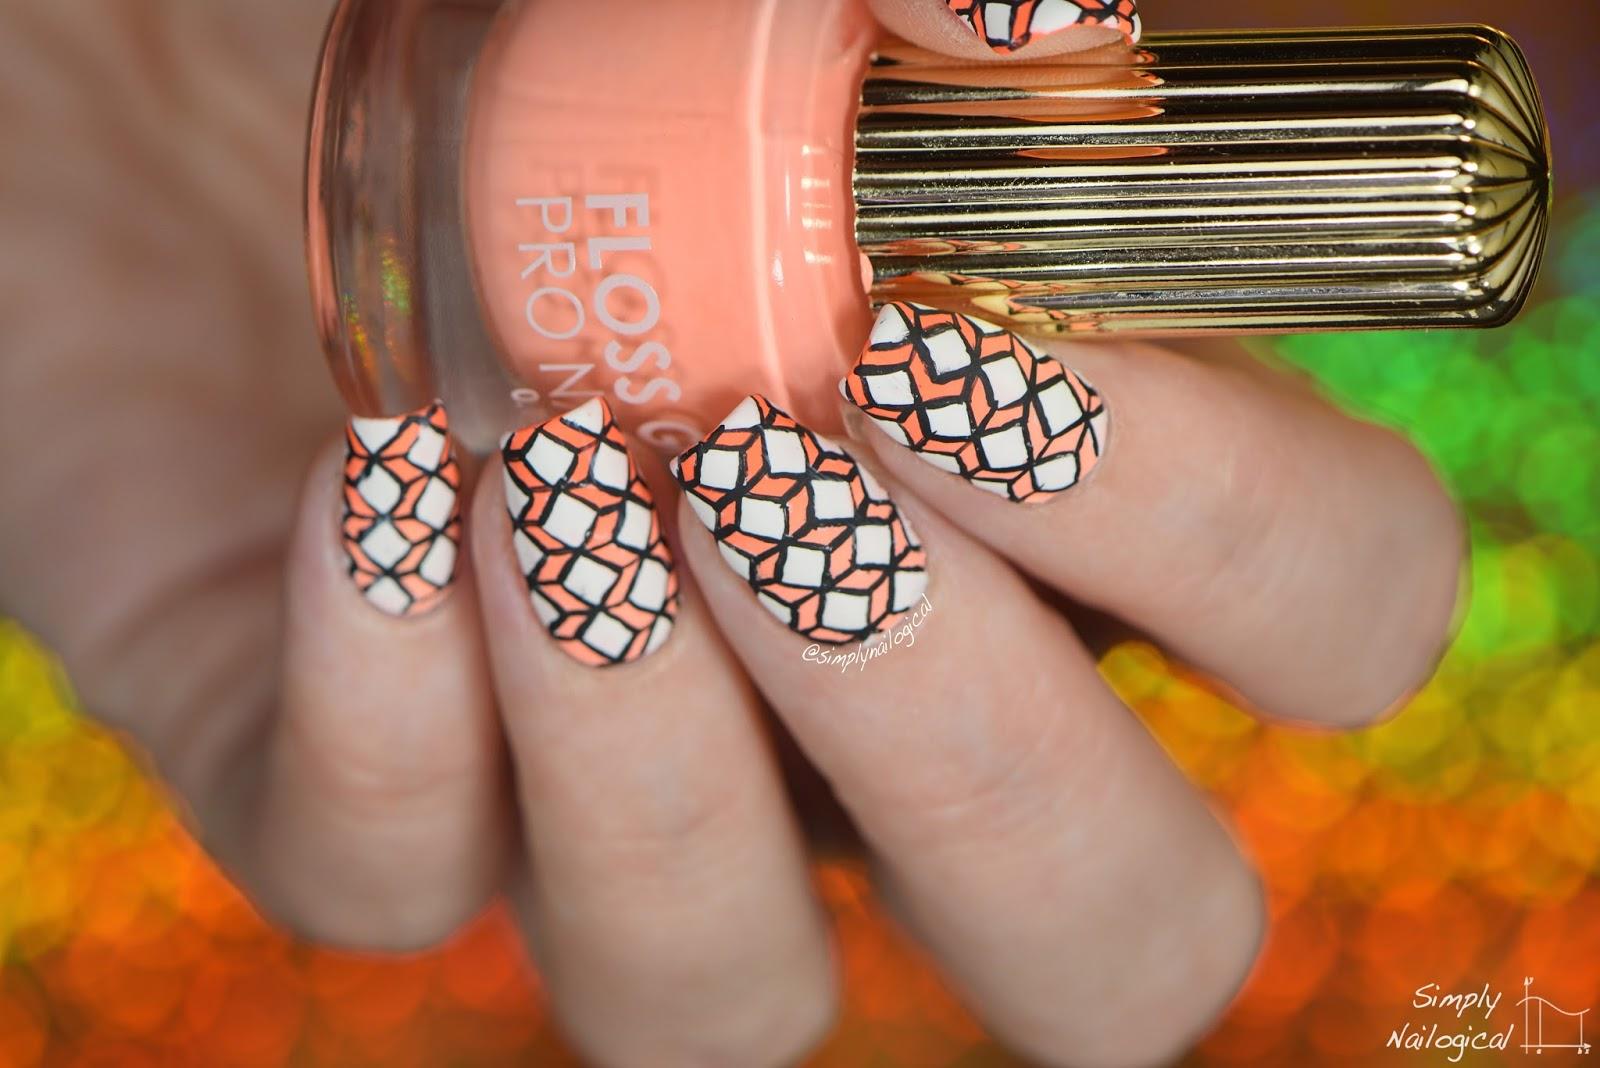 Simply Nailogical: Intricate diamond geometric design